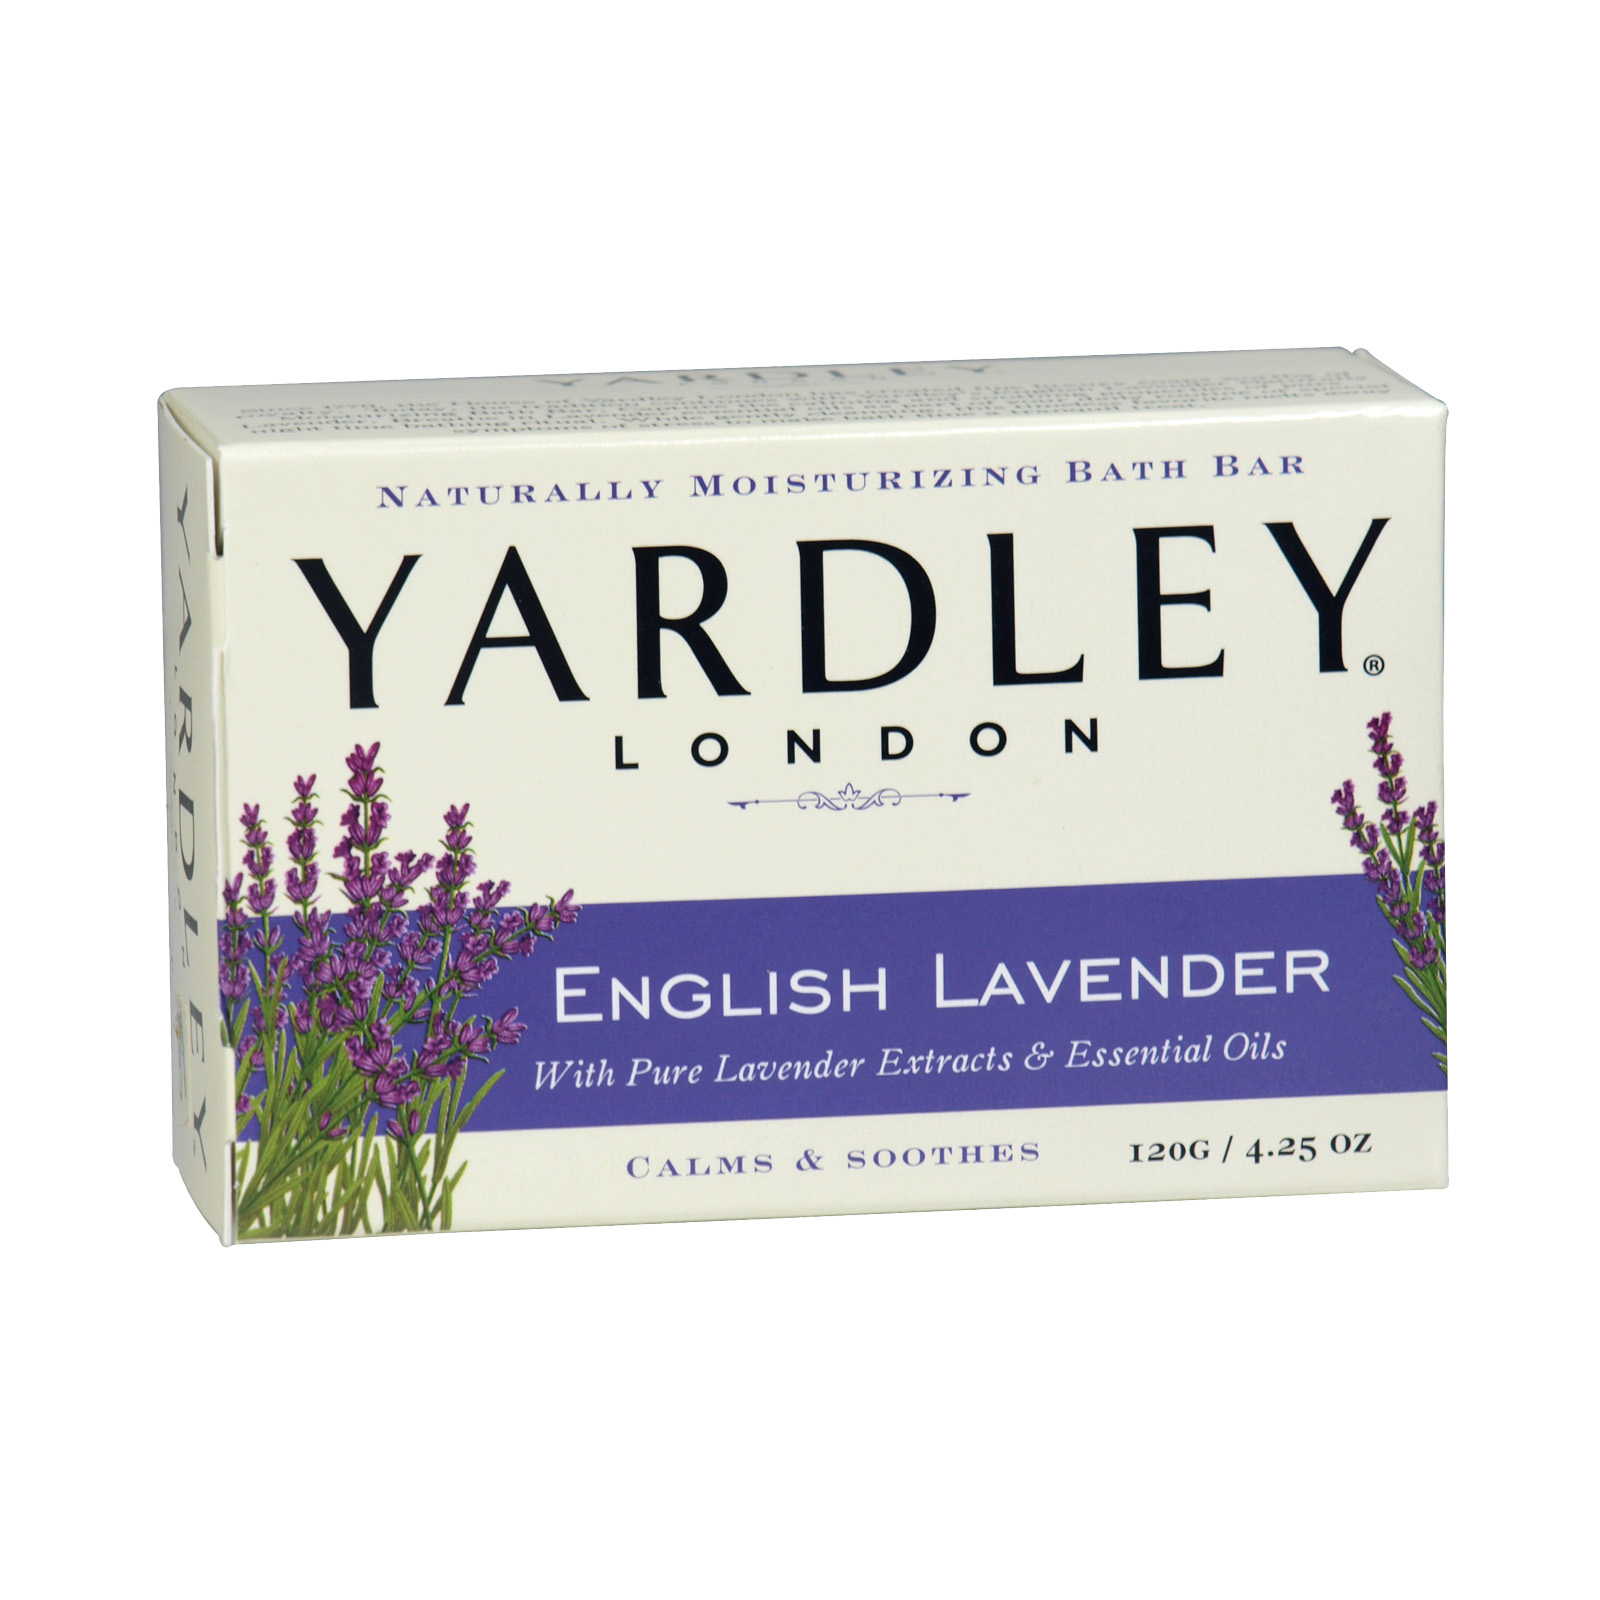 YARDLEY SOAP BOXED 120GM ENGLISH LAVENDER